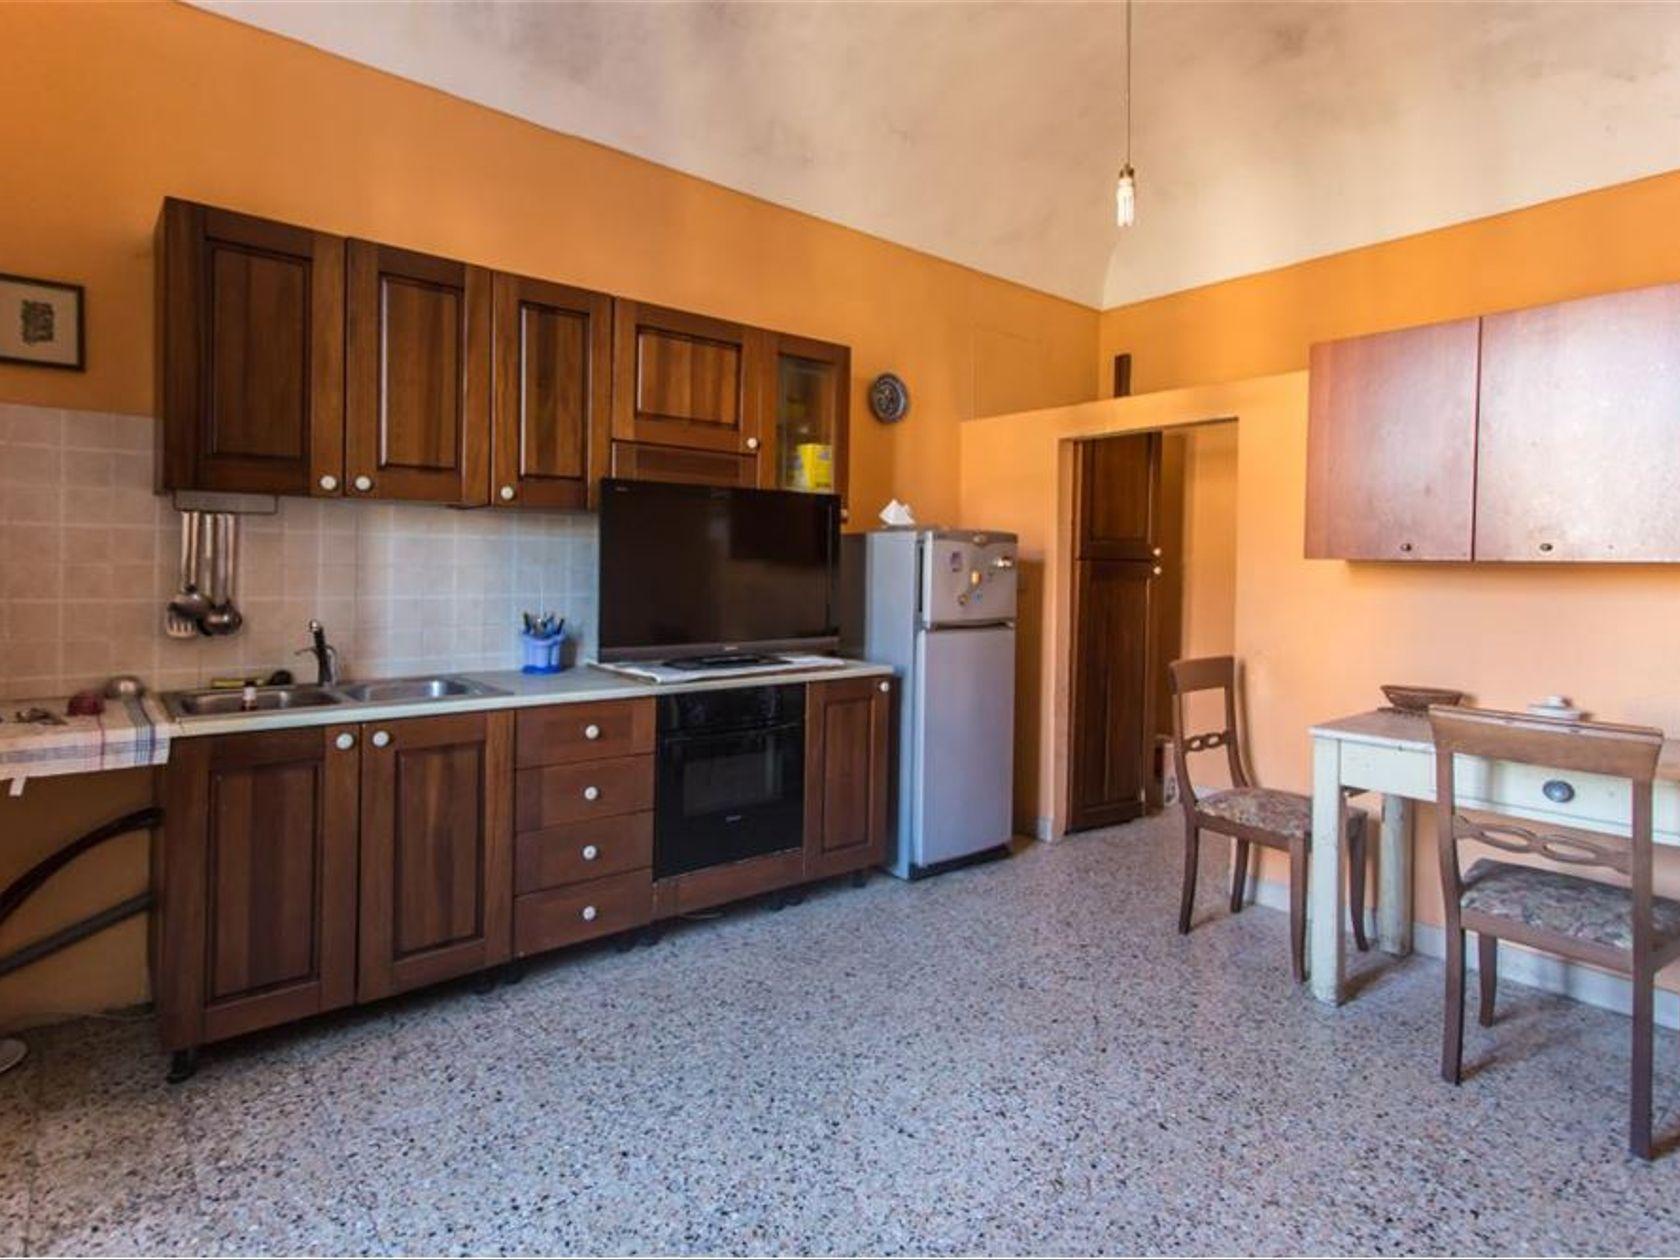 Appartamento Zona Ospedale, Pescara, PE Vendita - Foto 4